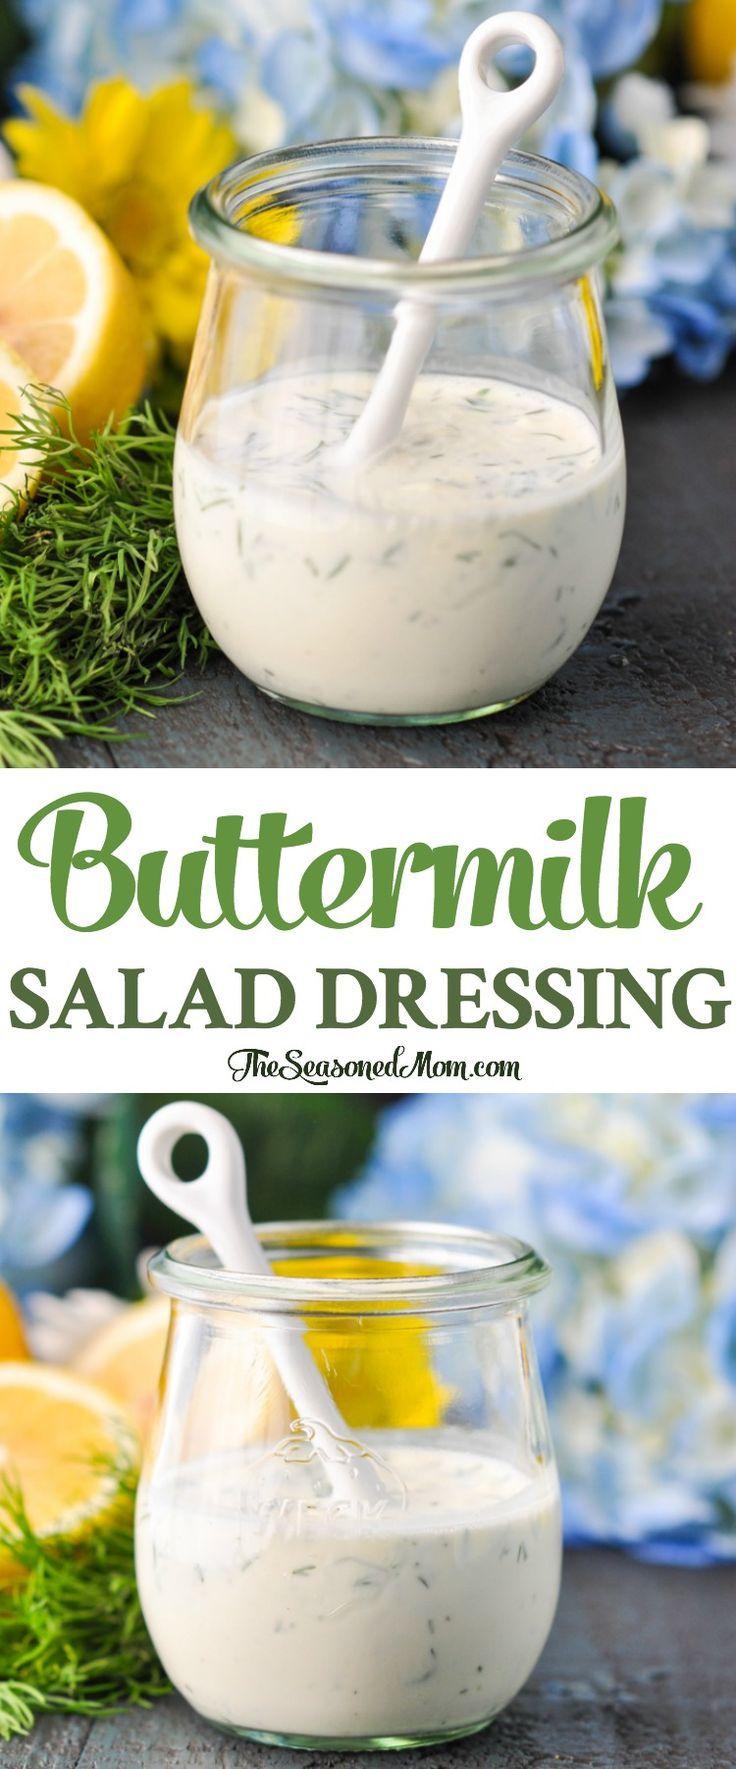 Buttermilk Dressing Recipe Salad Dressing Recipes Buttermilk Salad Dressing Recipes